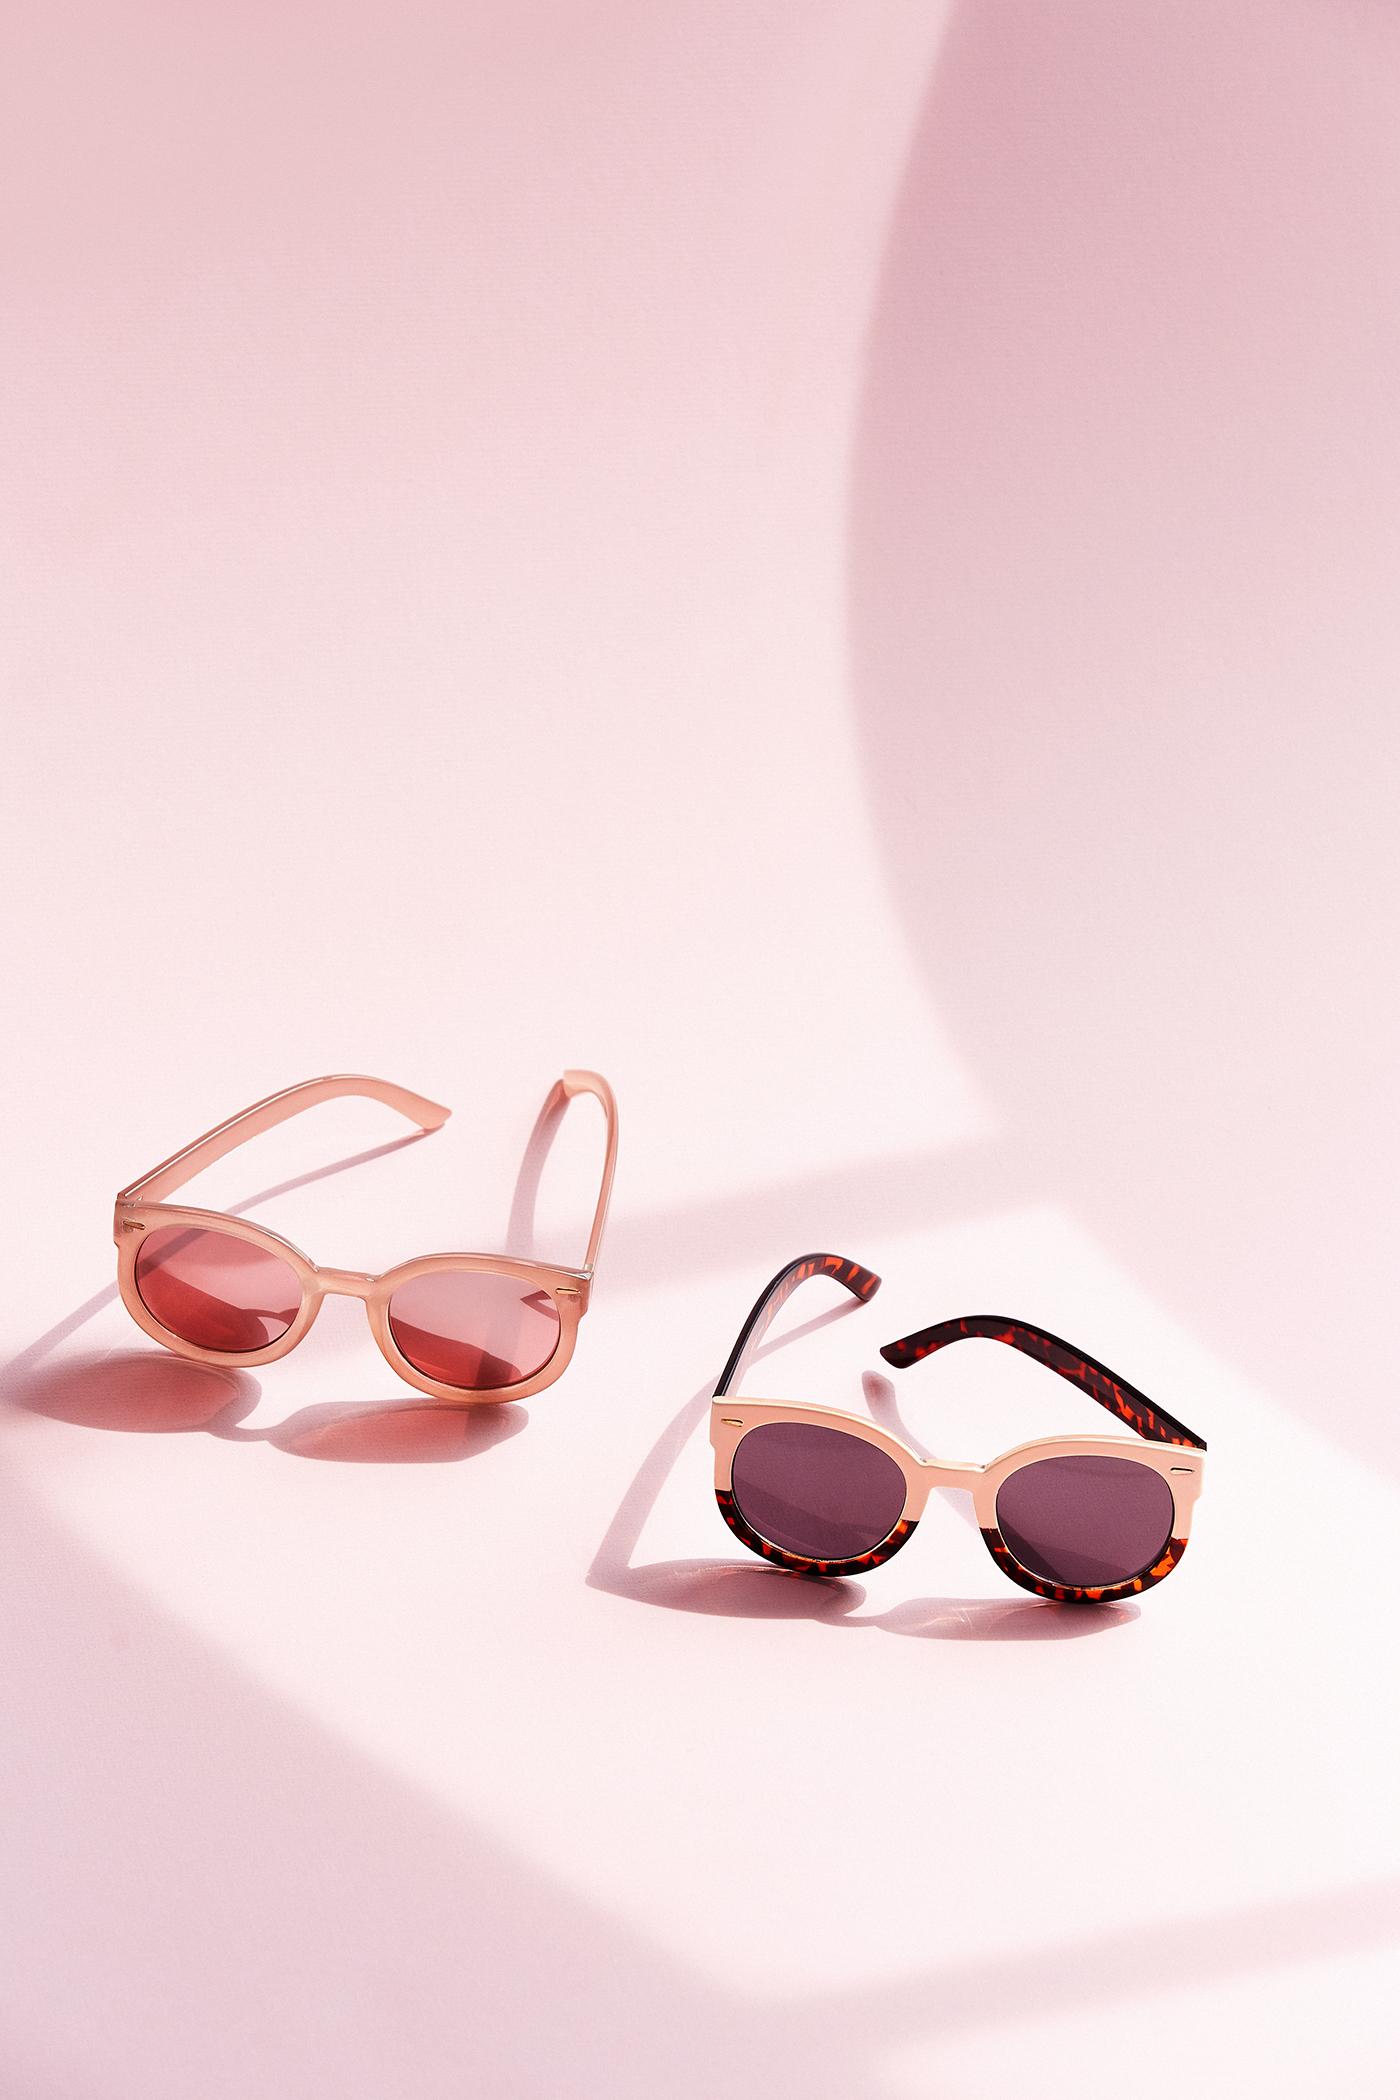 Sunglasses_16519.jpg